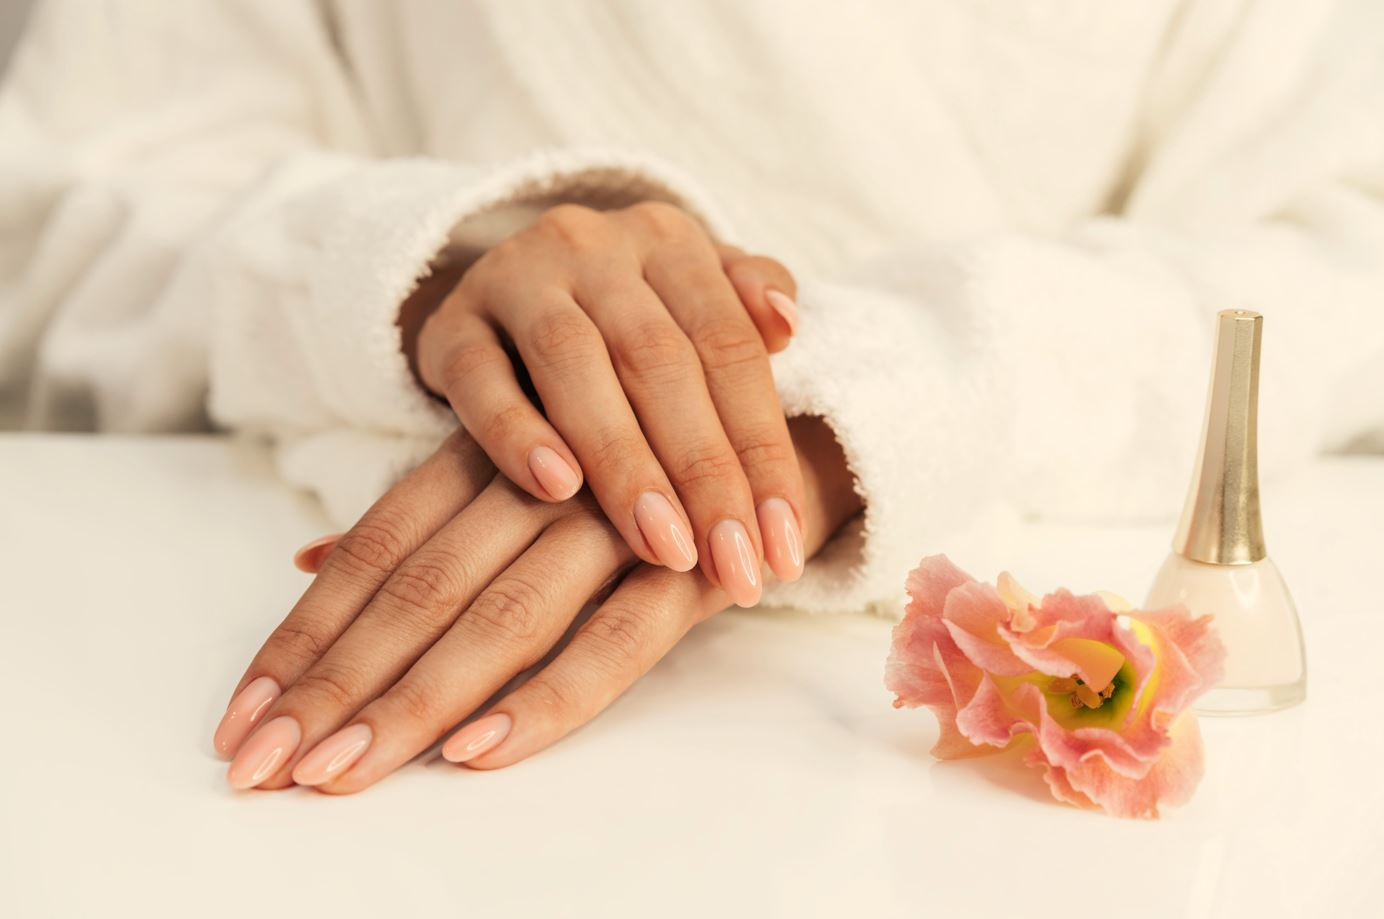 Kenali Ciri-ciri Kuku Sehat dan Terawat